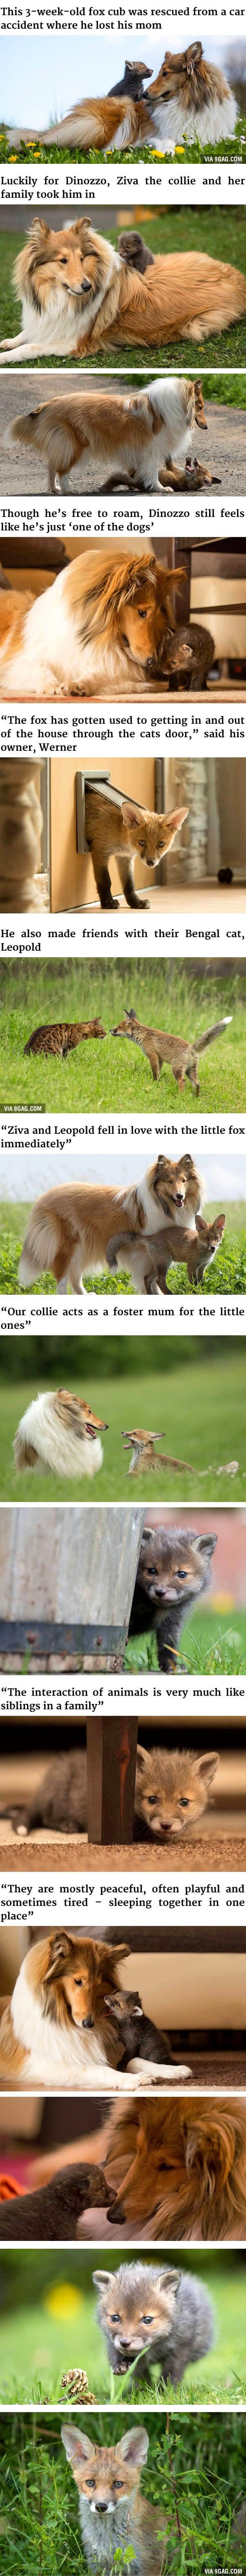 9-15-16-fox-collie1